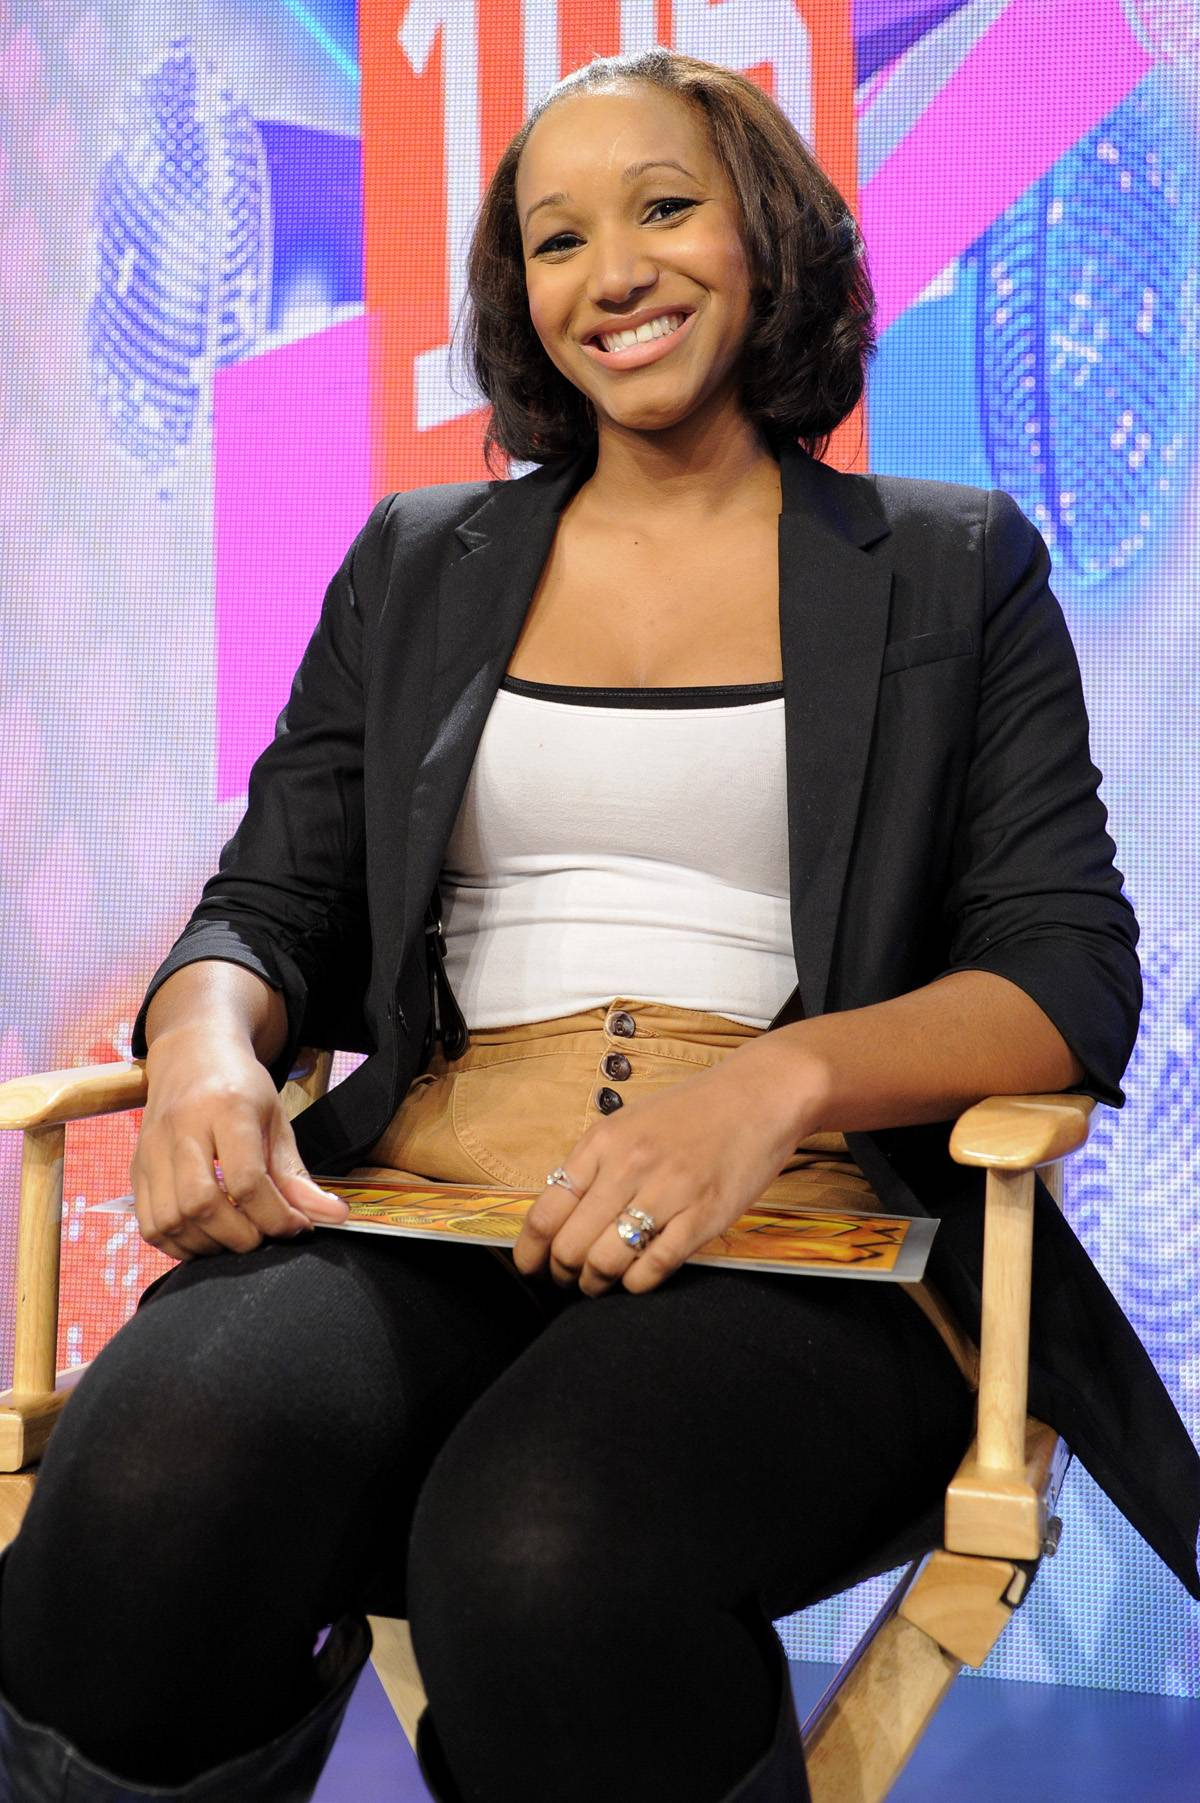 Laid-back - Freestyle Friday judge Amber McKynzie, associate editor at XXL Magazine, at 106 & Park, January 20, 2012. (Photo: John Ricard / BET)